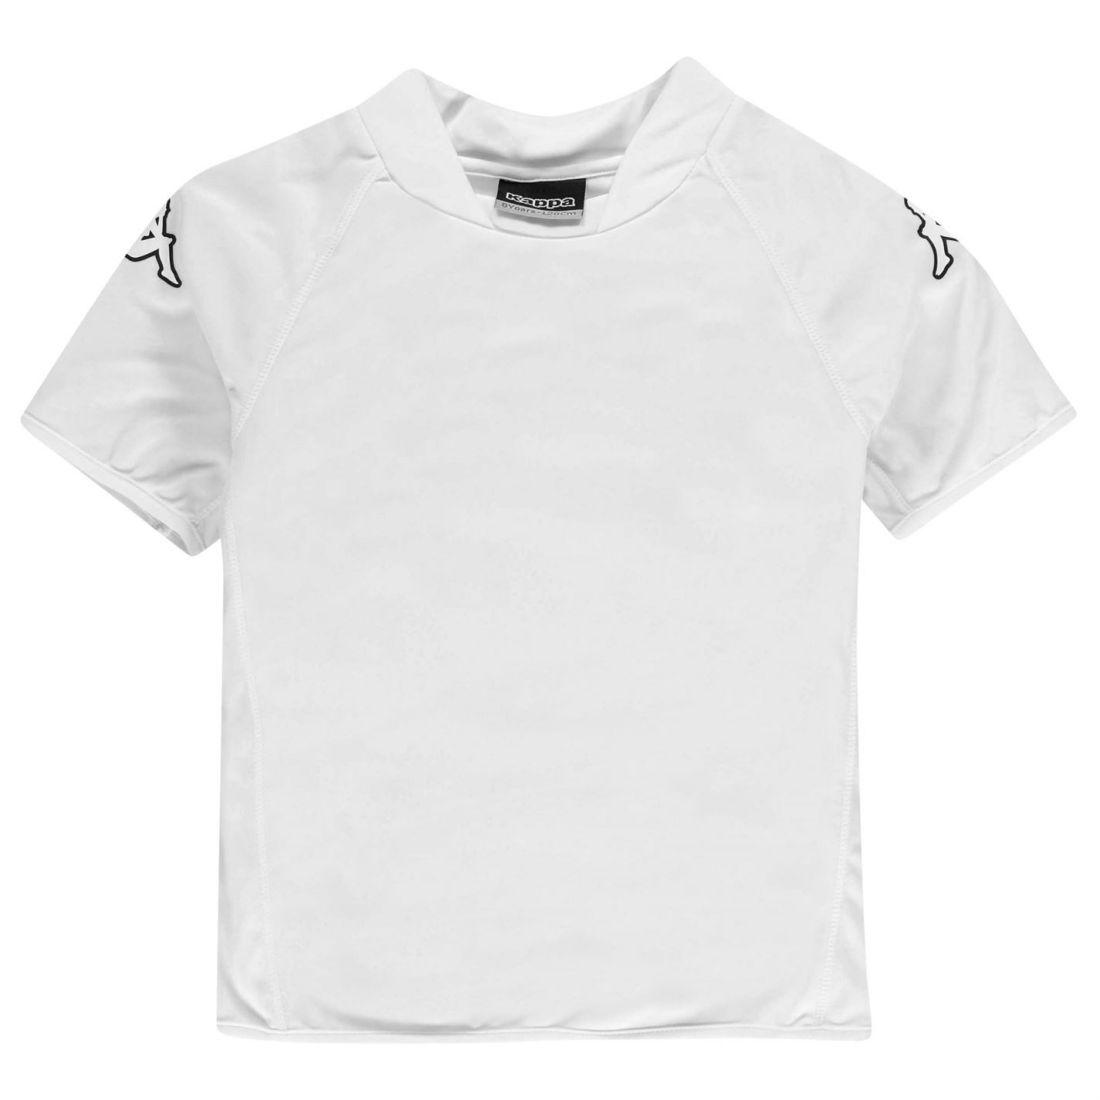 1dcc0a576278 Kappa Kids Masa Short Sleeve T Shirt Tee Top Junior Boys ...